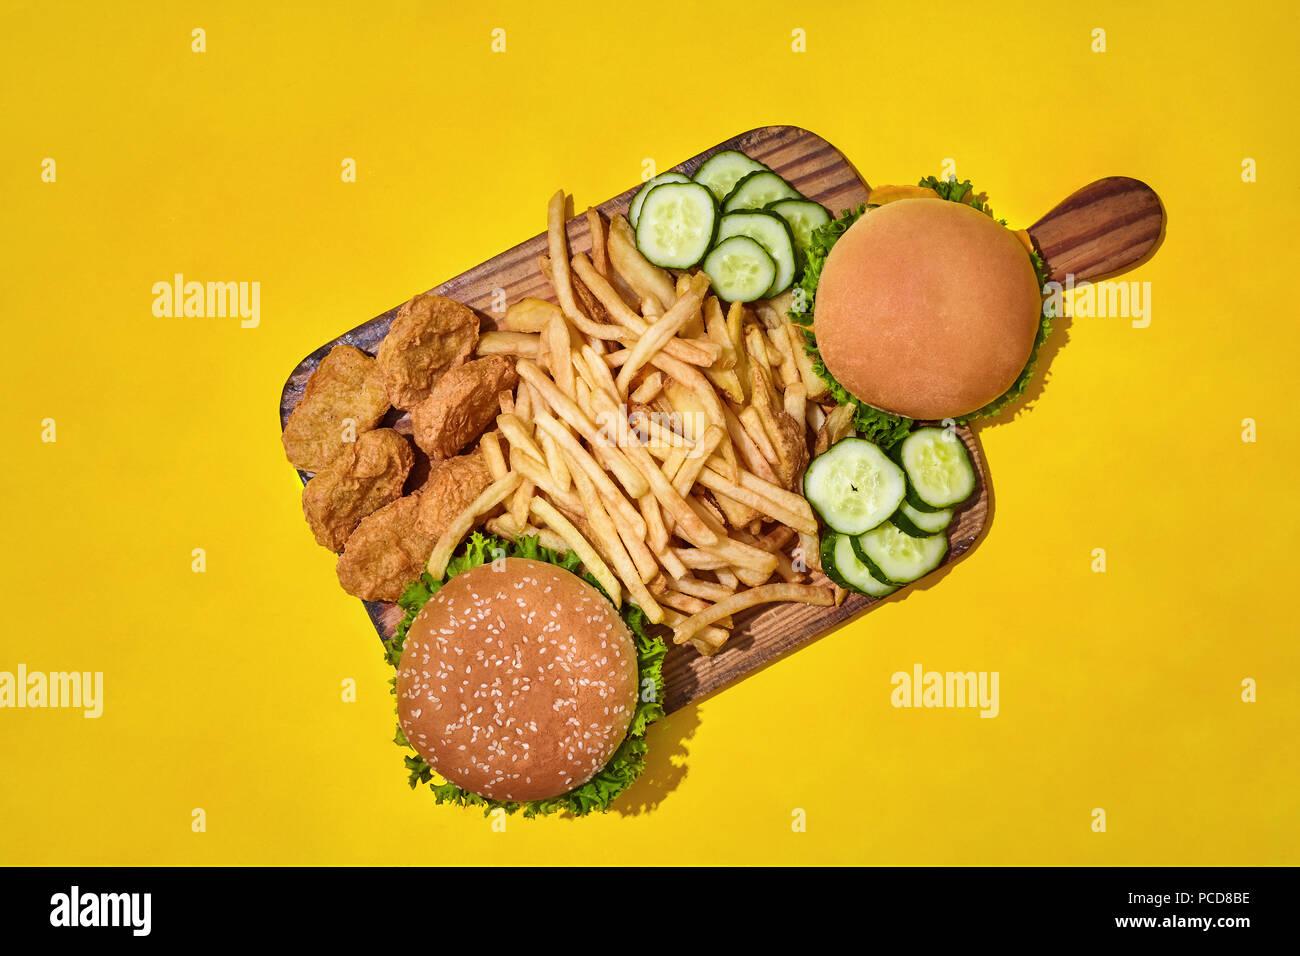 Fast Food Set Menu Yellow Gradient Background Fast Food: Pizza Chicken Burger Stock Photos & Pizza Chicken Burger